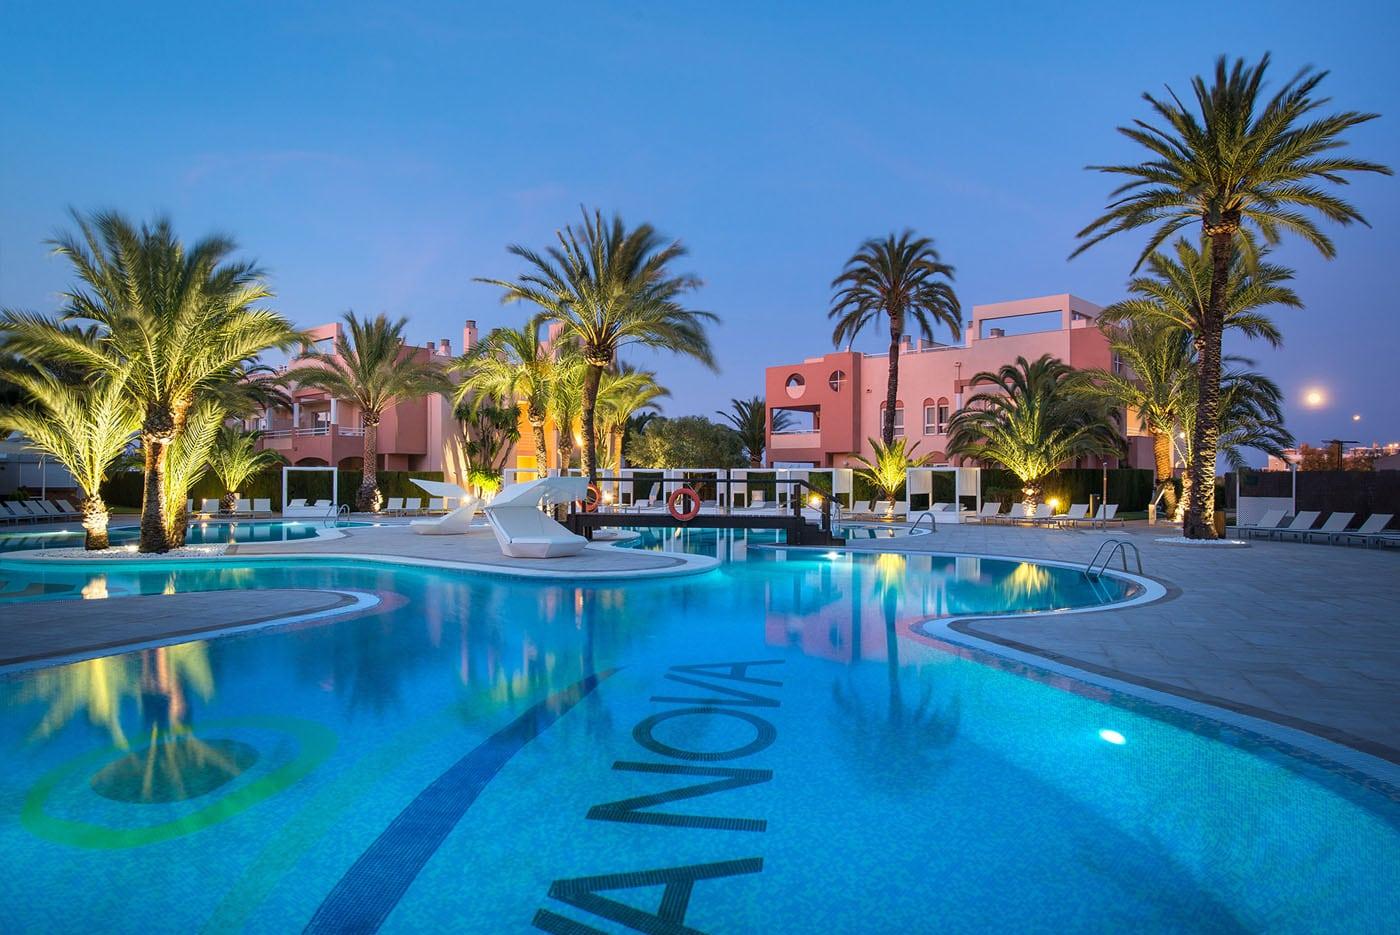 oliva-nova-hotel-adolfo-gosalvez-hoteles-panoramicos